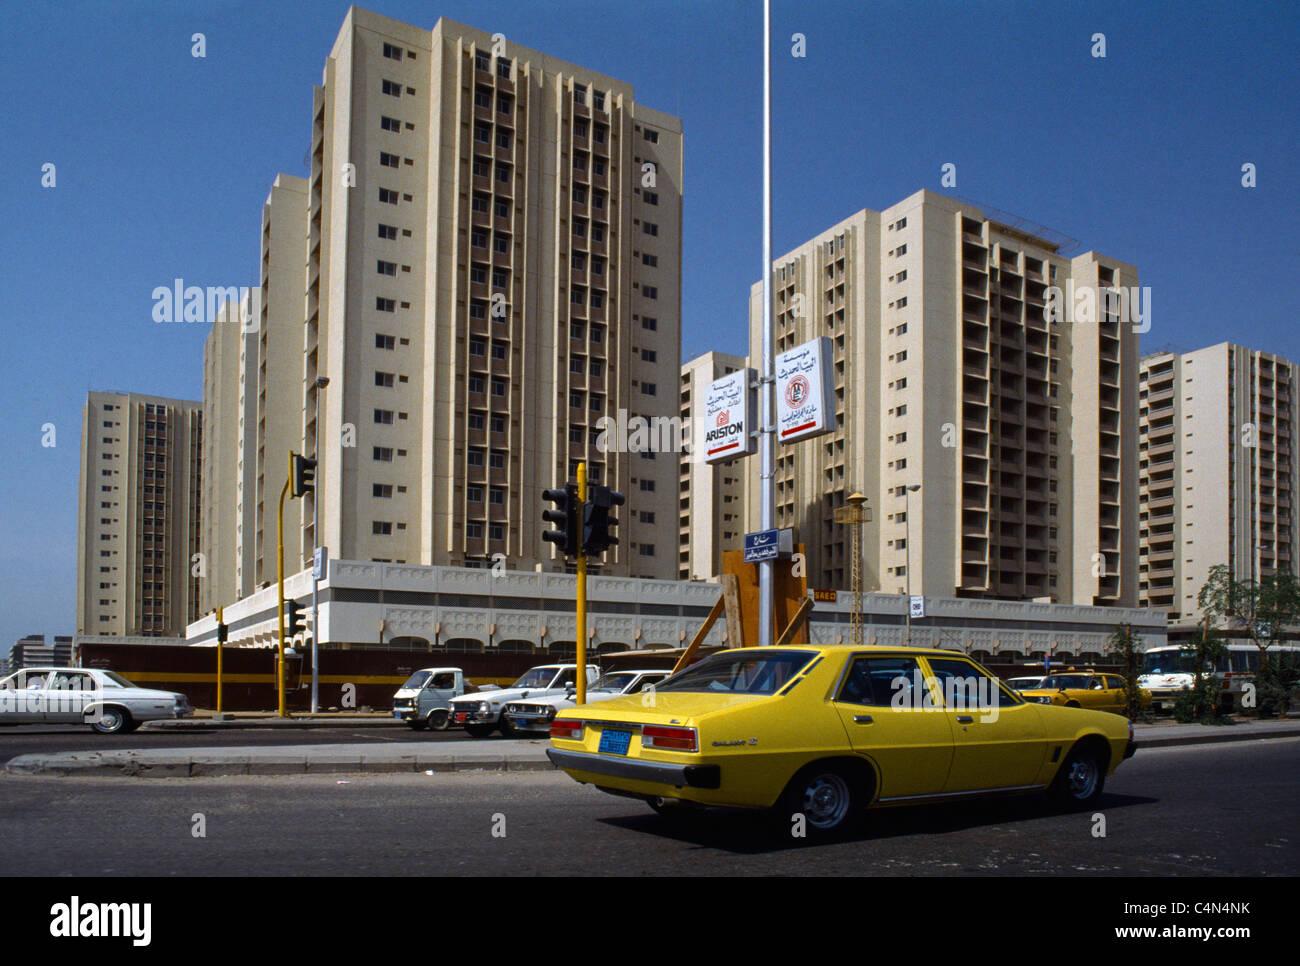 Riyadh Saudi Arabia Street Scene Traffic On Road By Traffic Lights - Stock Image